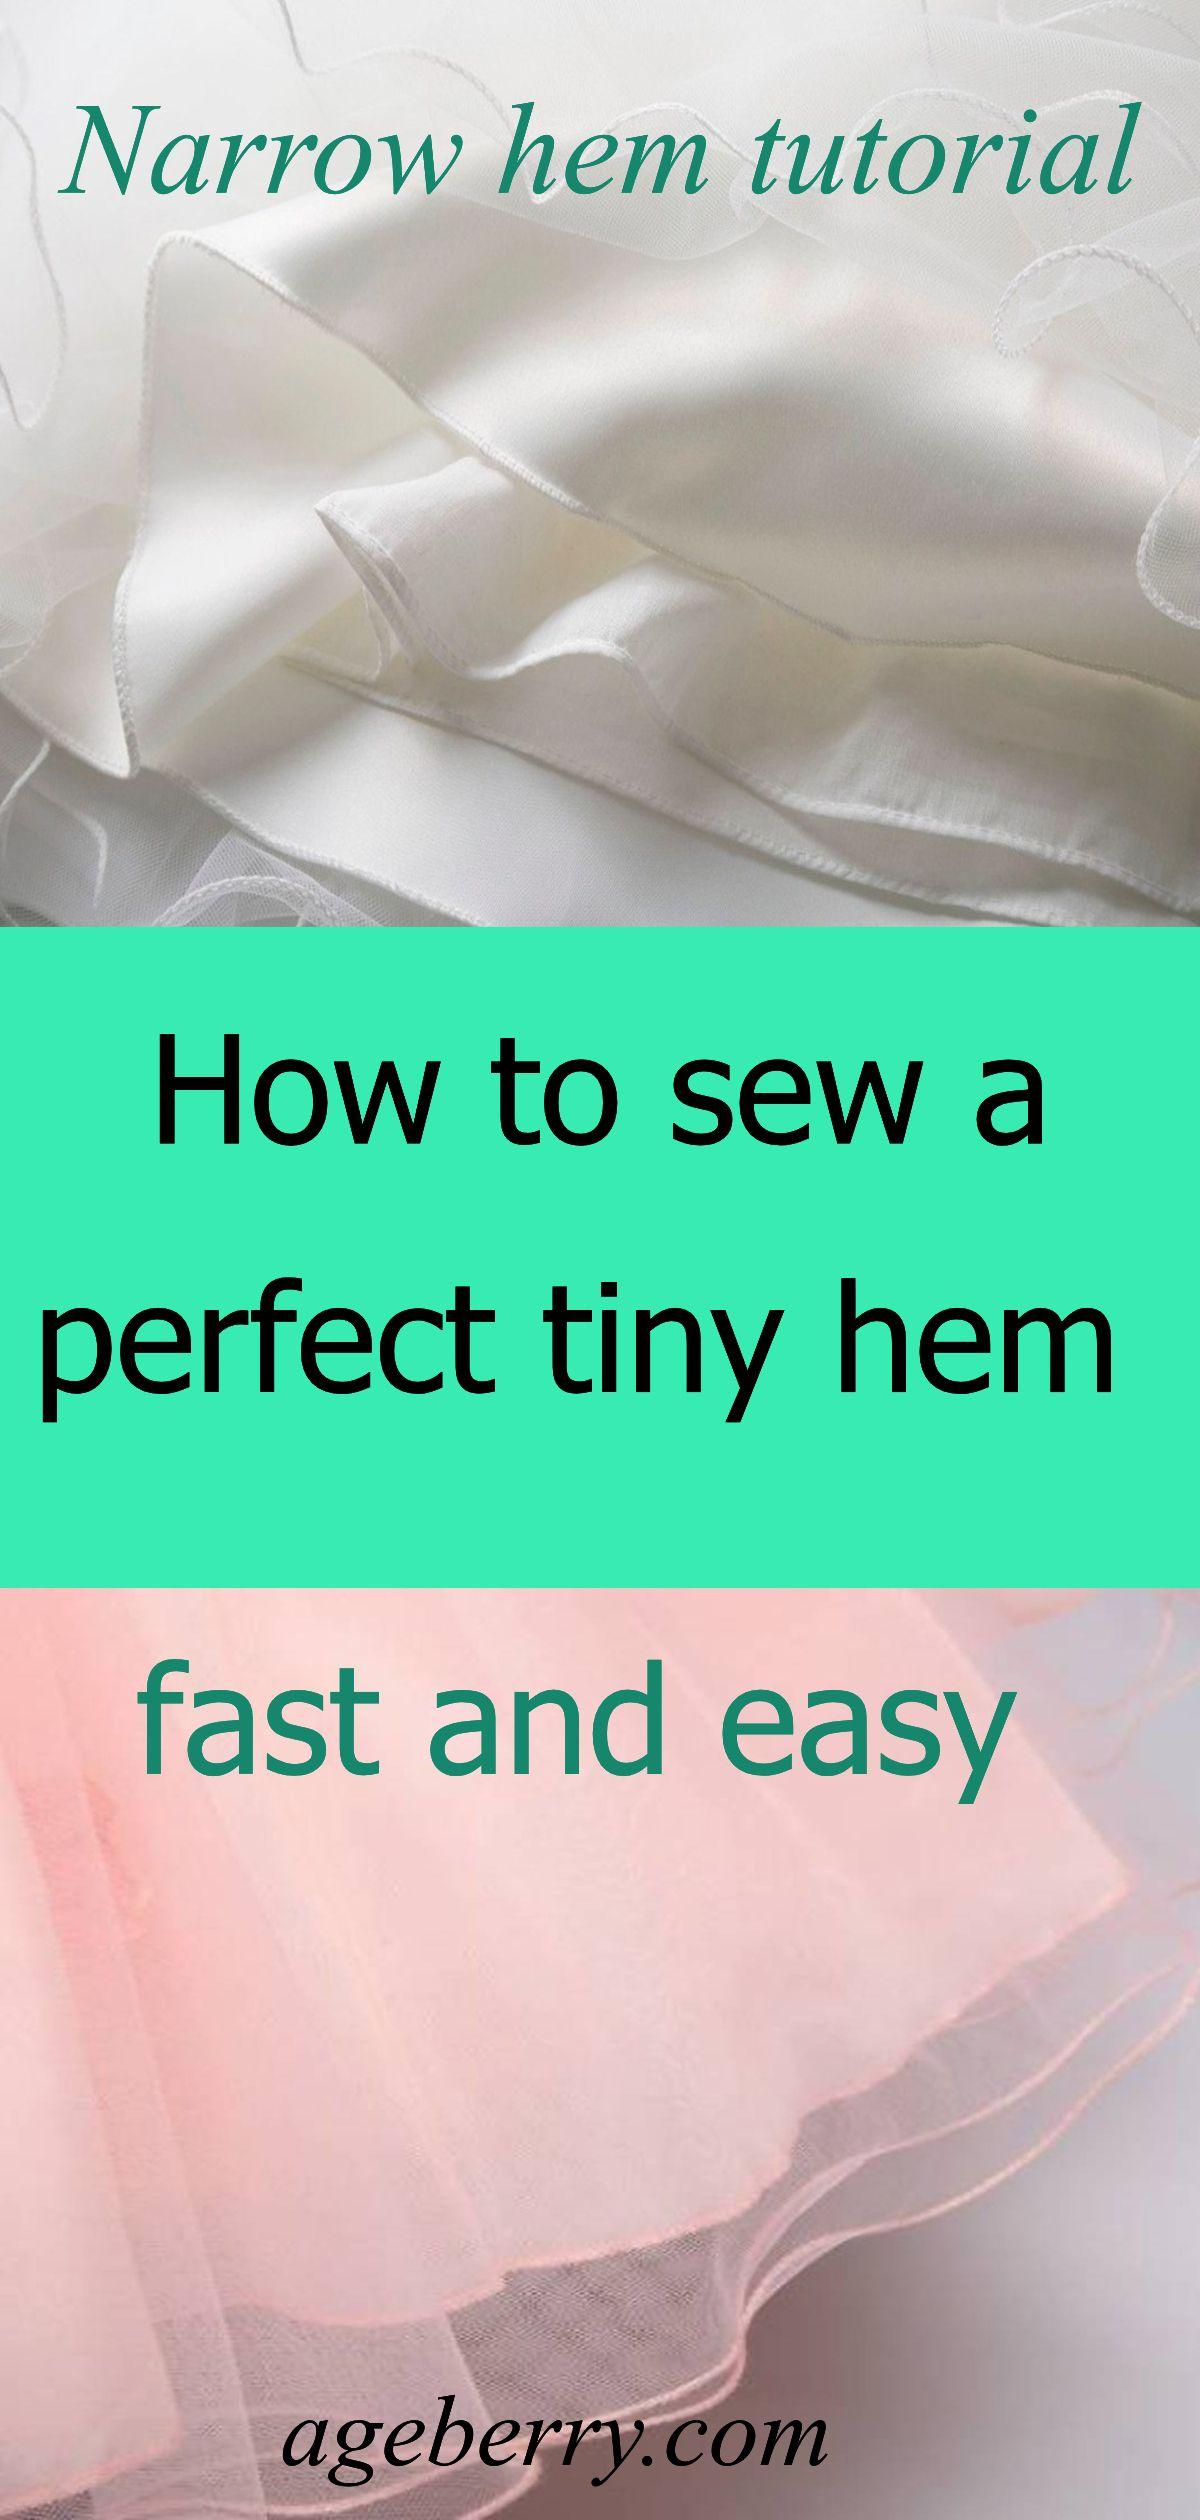 Narrow hem tutorial: how to make narrow hem using Ban Roll tape #sewingtechniques